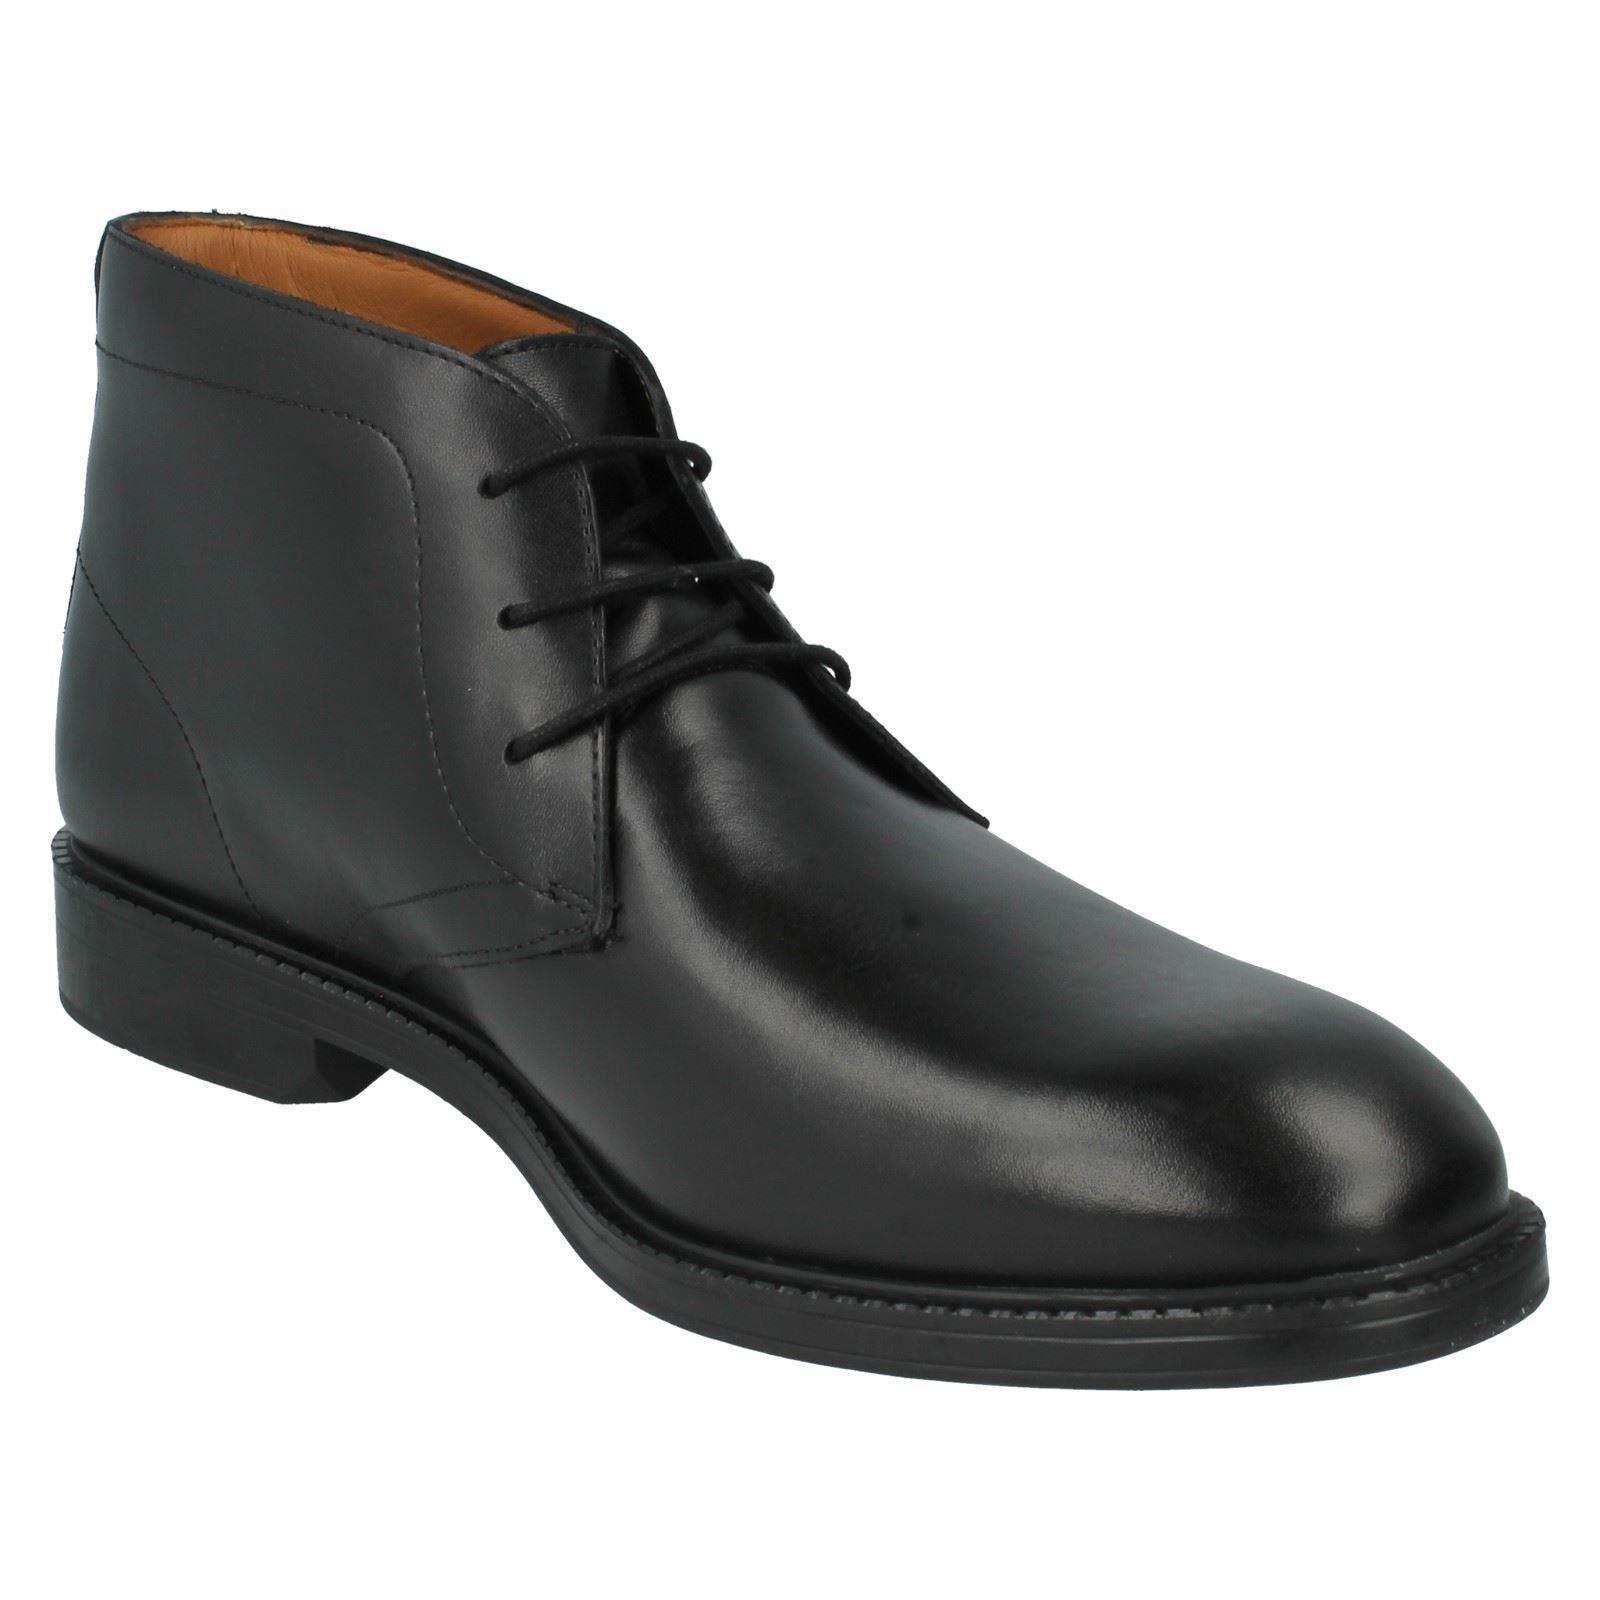 Men's Clarks Casual Ankle Stiefel Label  Chilver Hi GTX